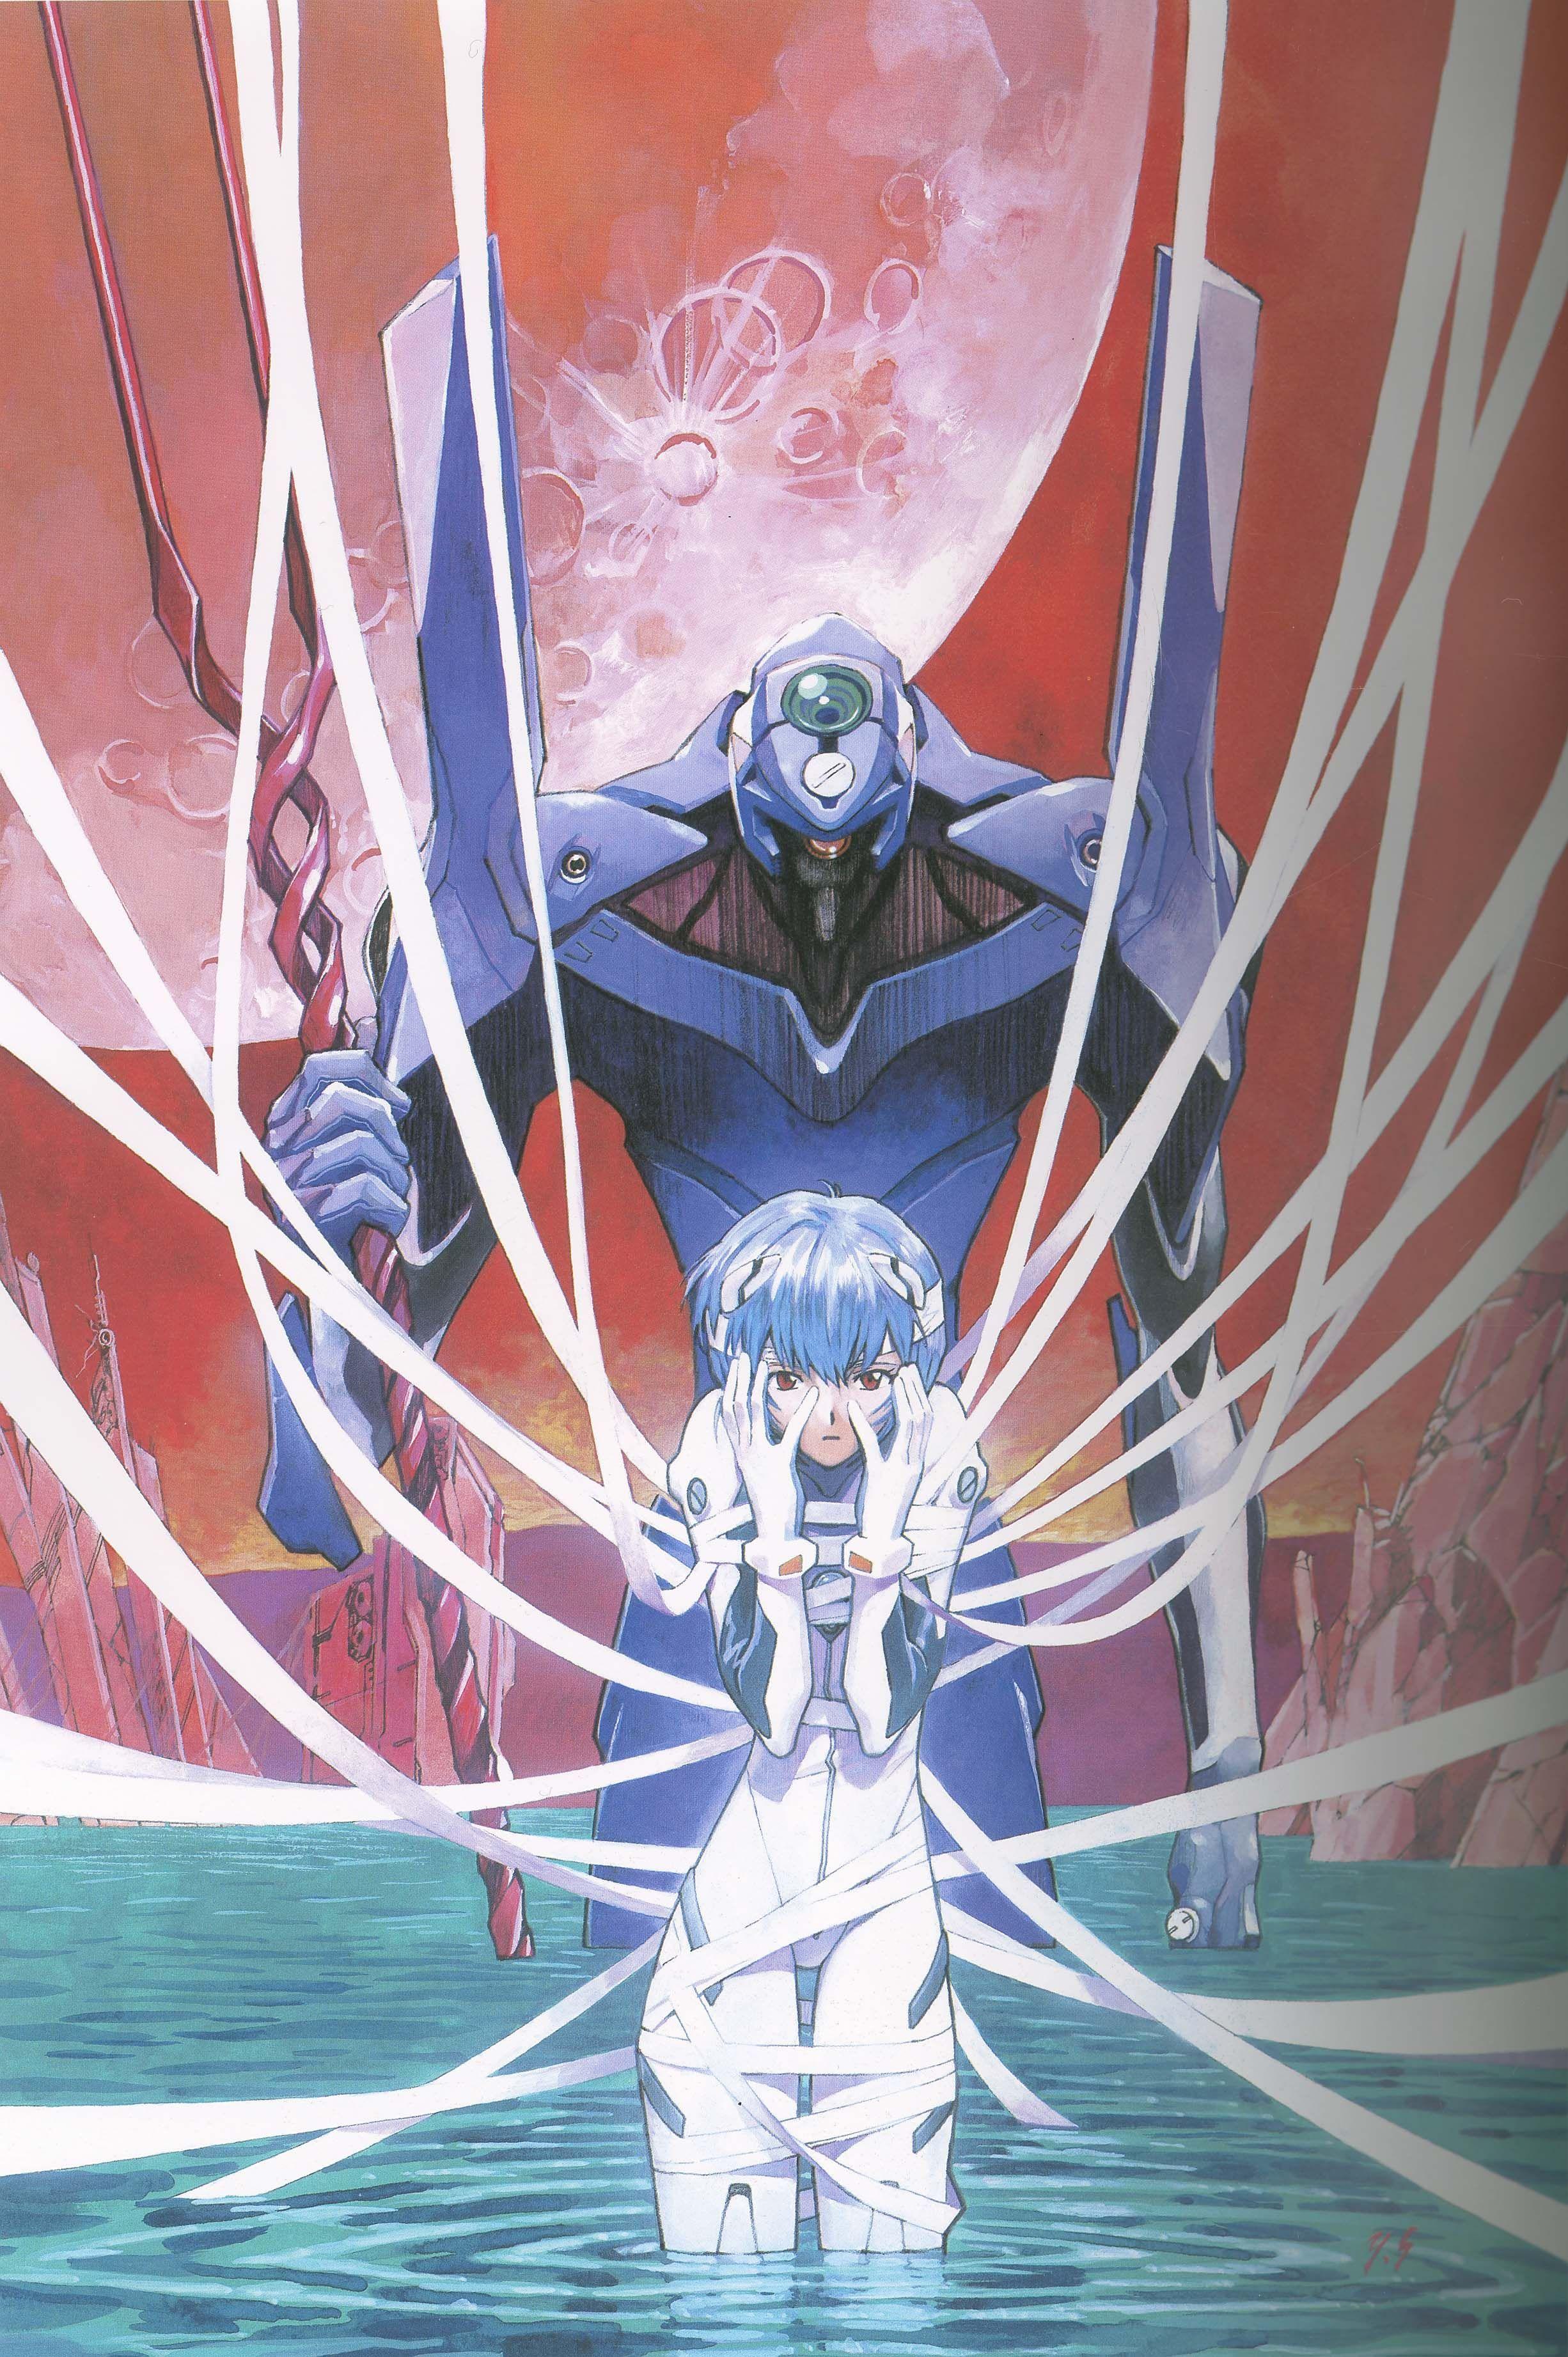 Ayanami Rei 439196 Fullsize Image 2452x3686 Zerochan Evangelion Art Evangelion Neon Genesis Evangelion